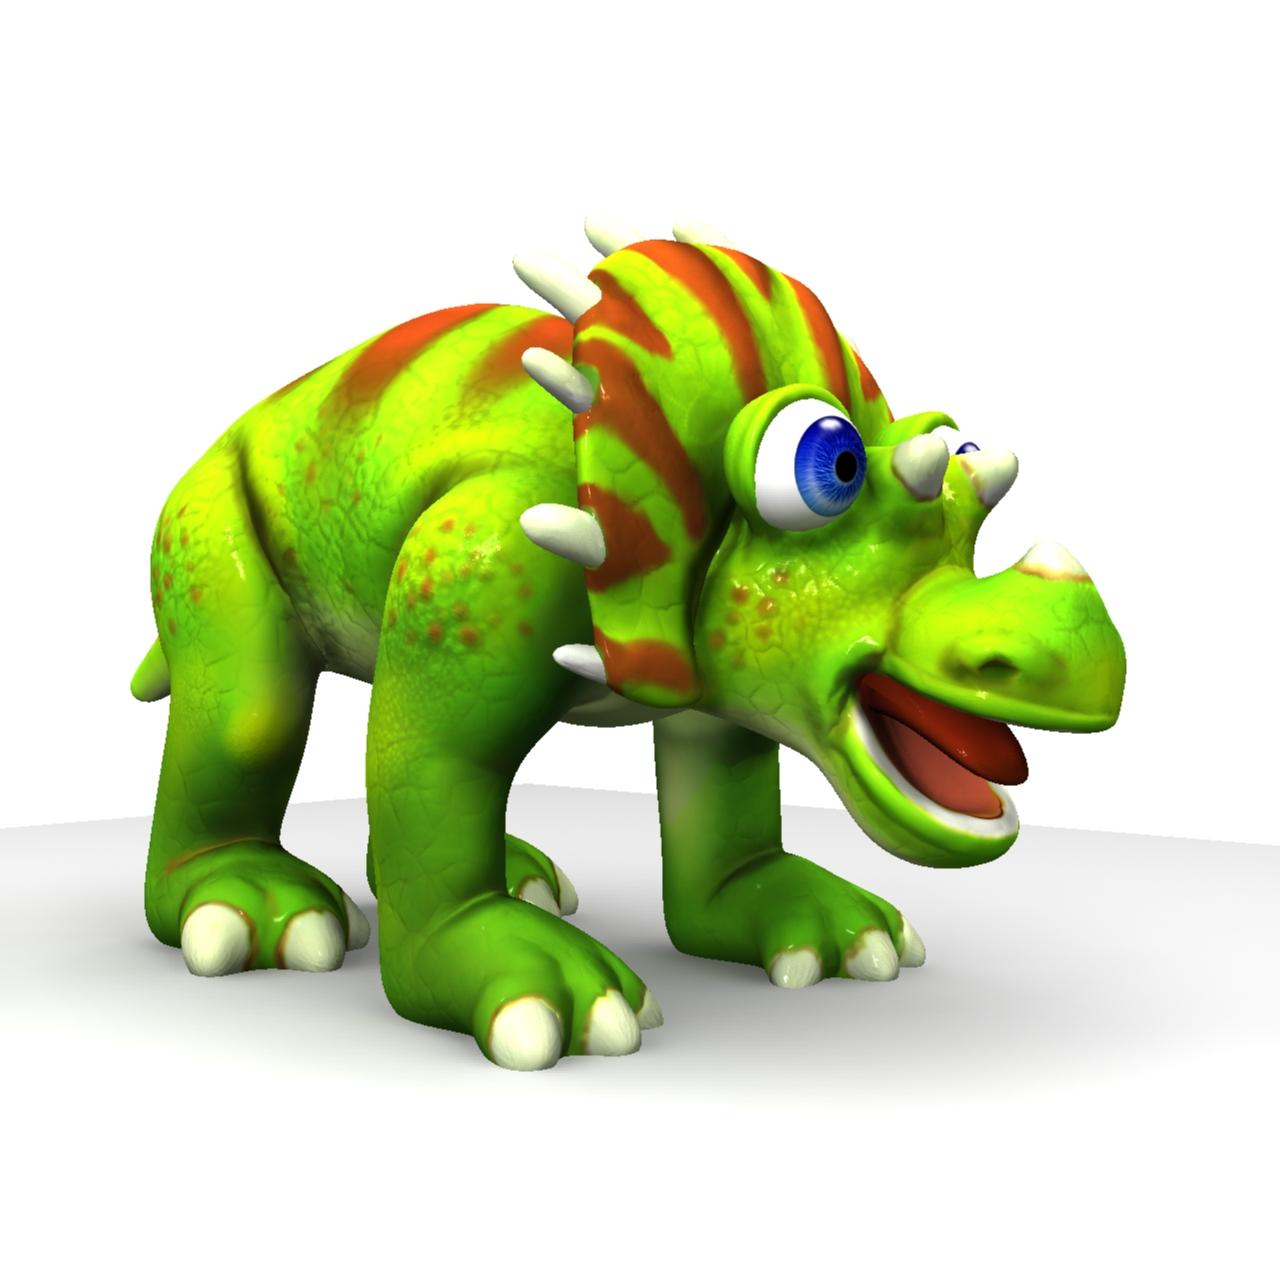 cizgi triceratops 3d model max fbx obj 212436